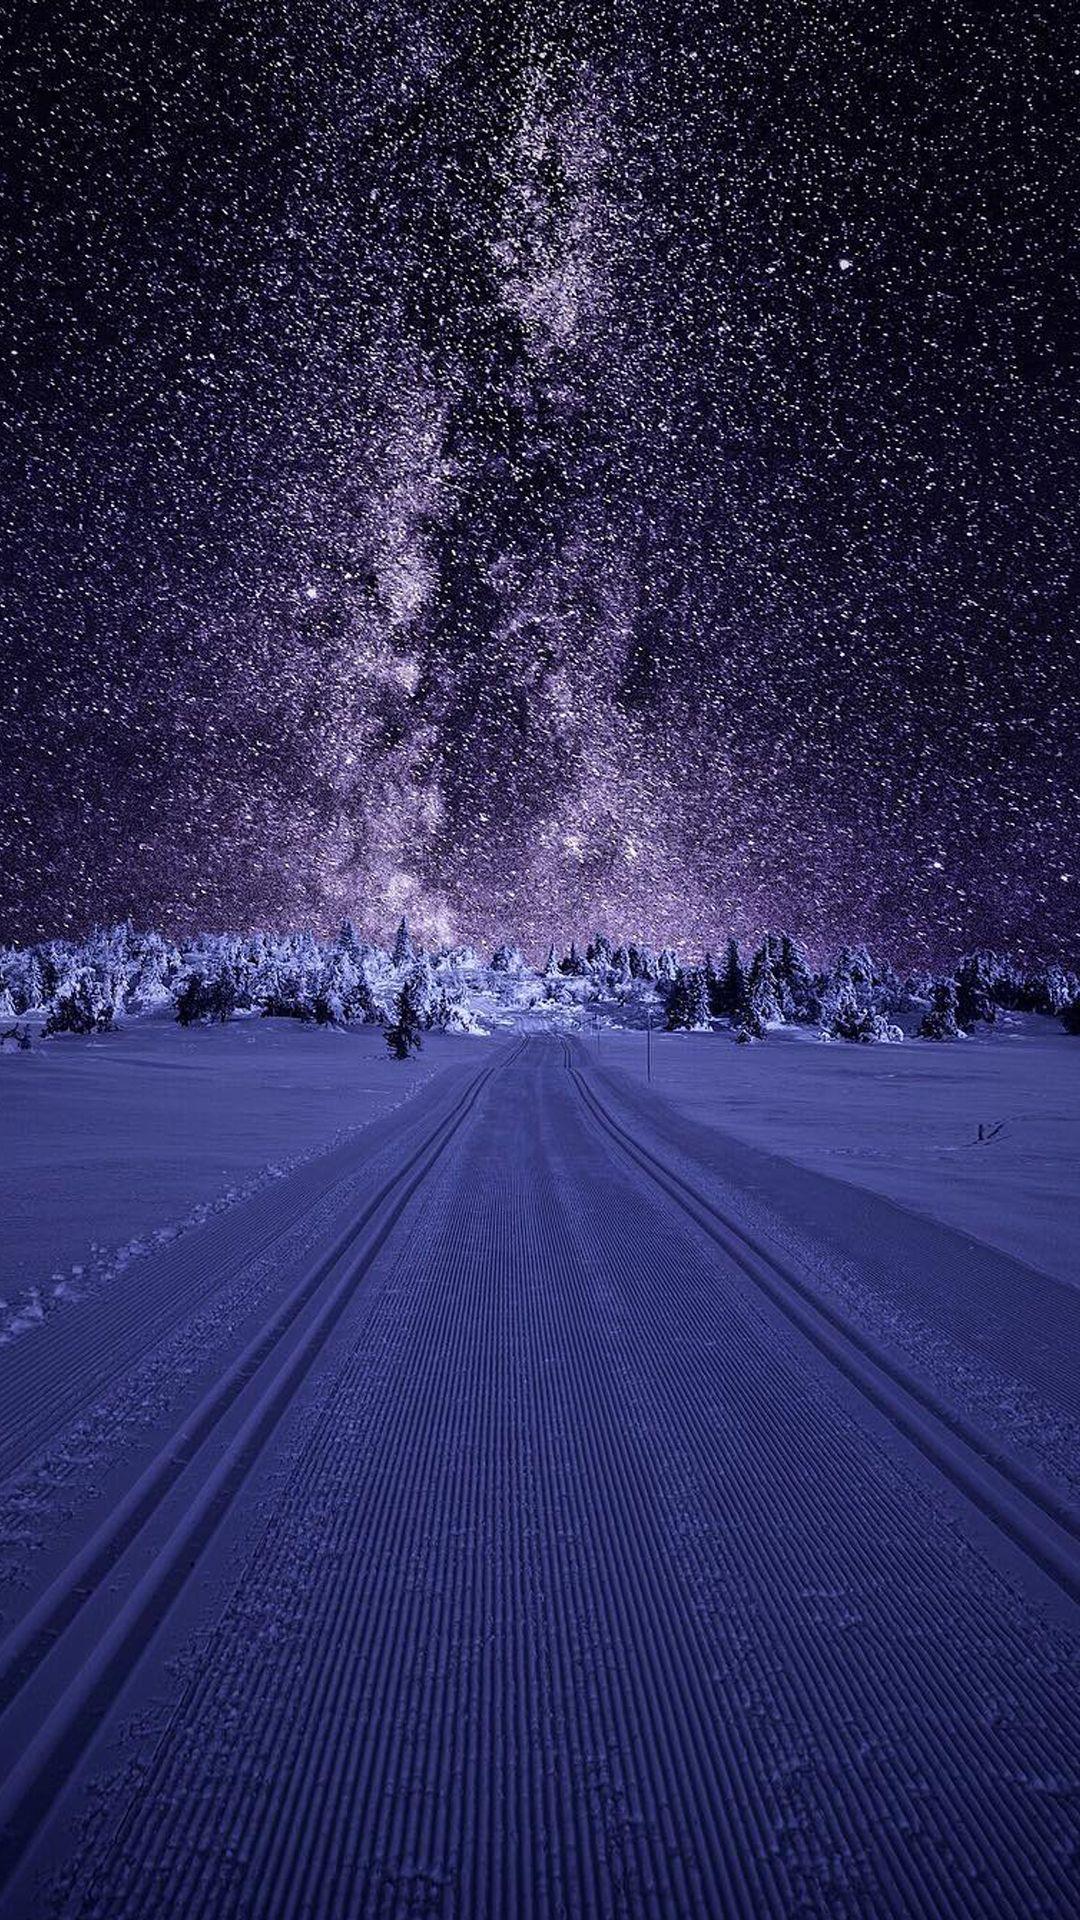 Art Nature Wallpaper for Samsung Galaxy J7 Prime Background - Stars and Snow | Fondos | Samsung ...